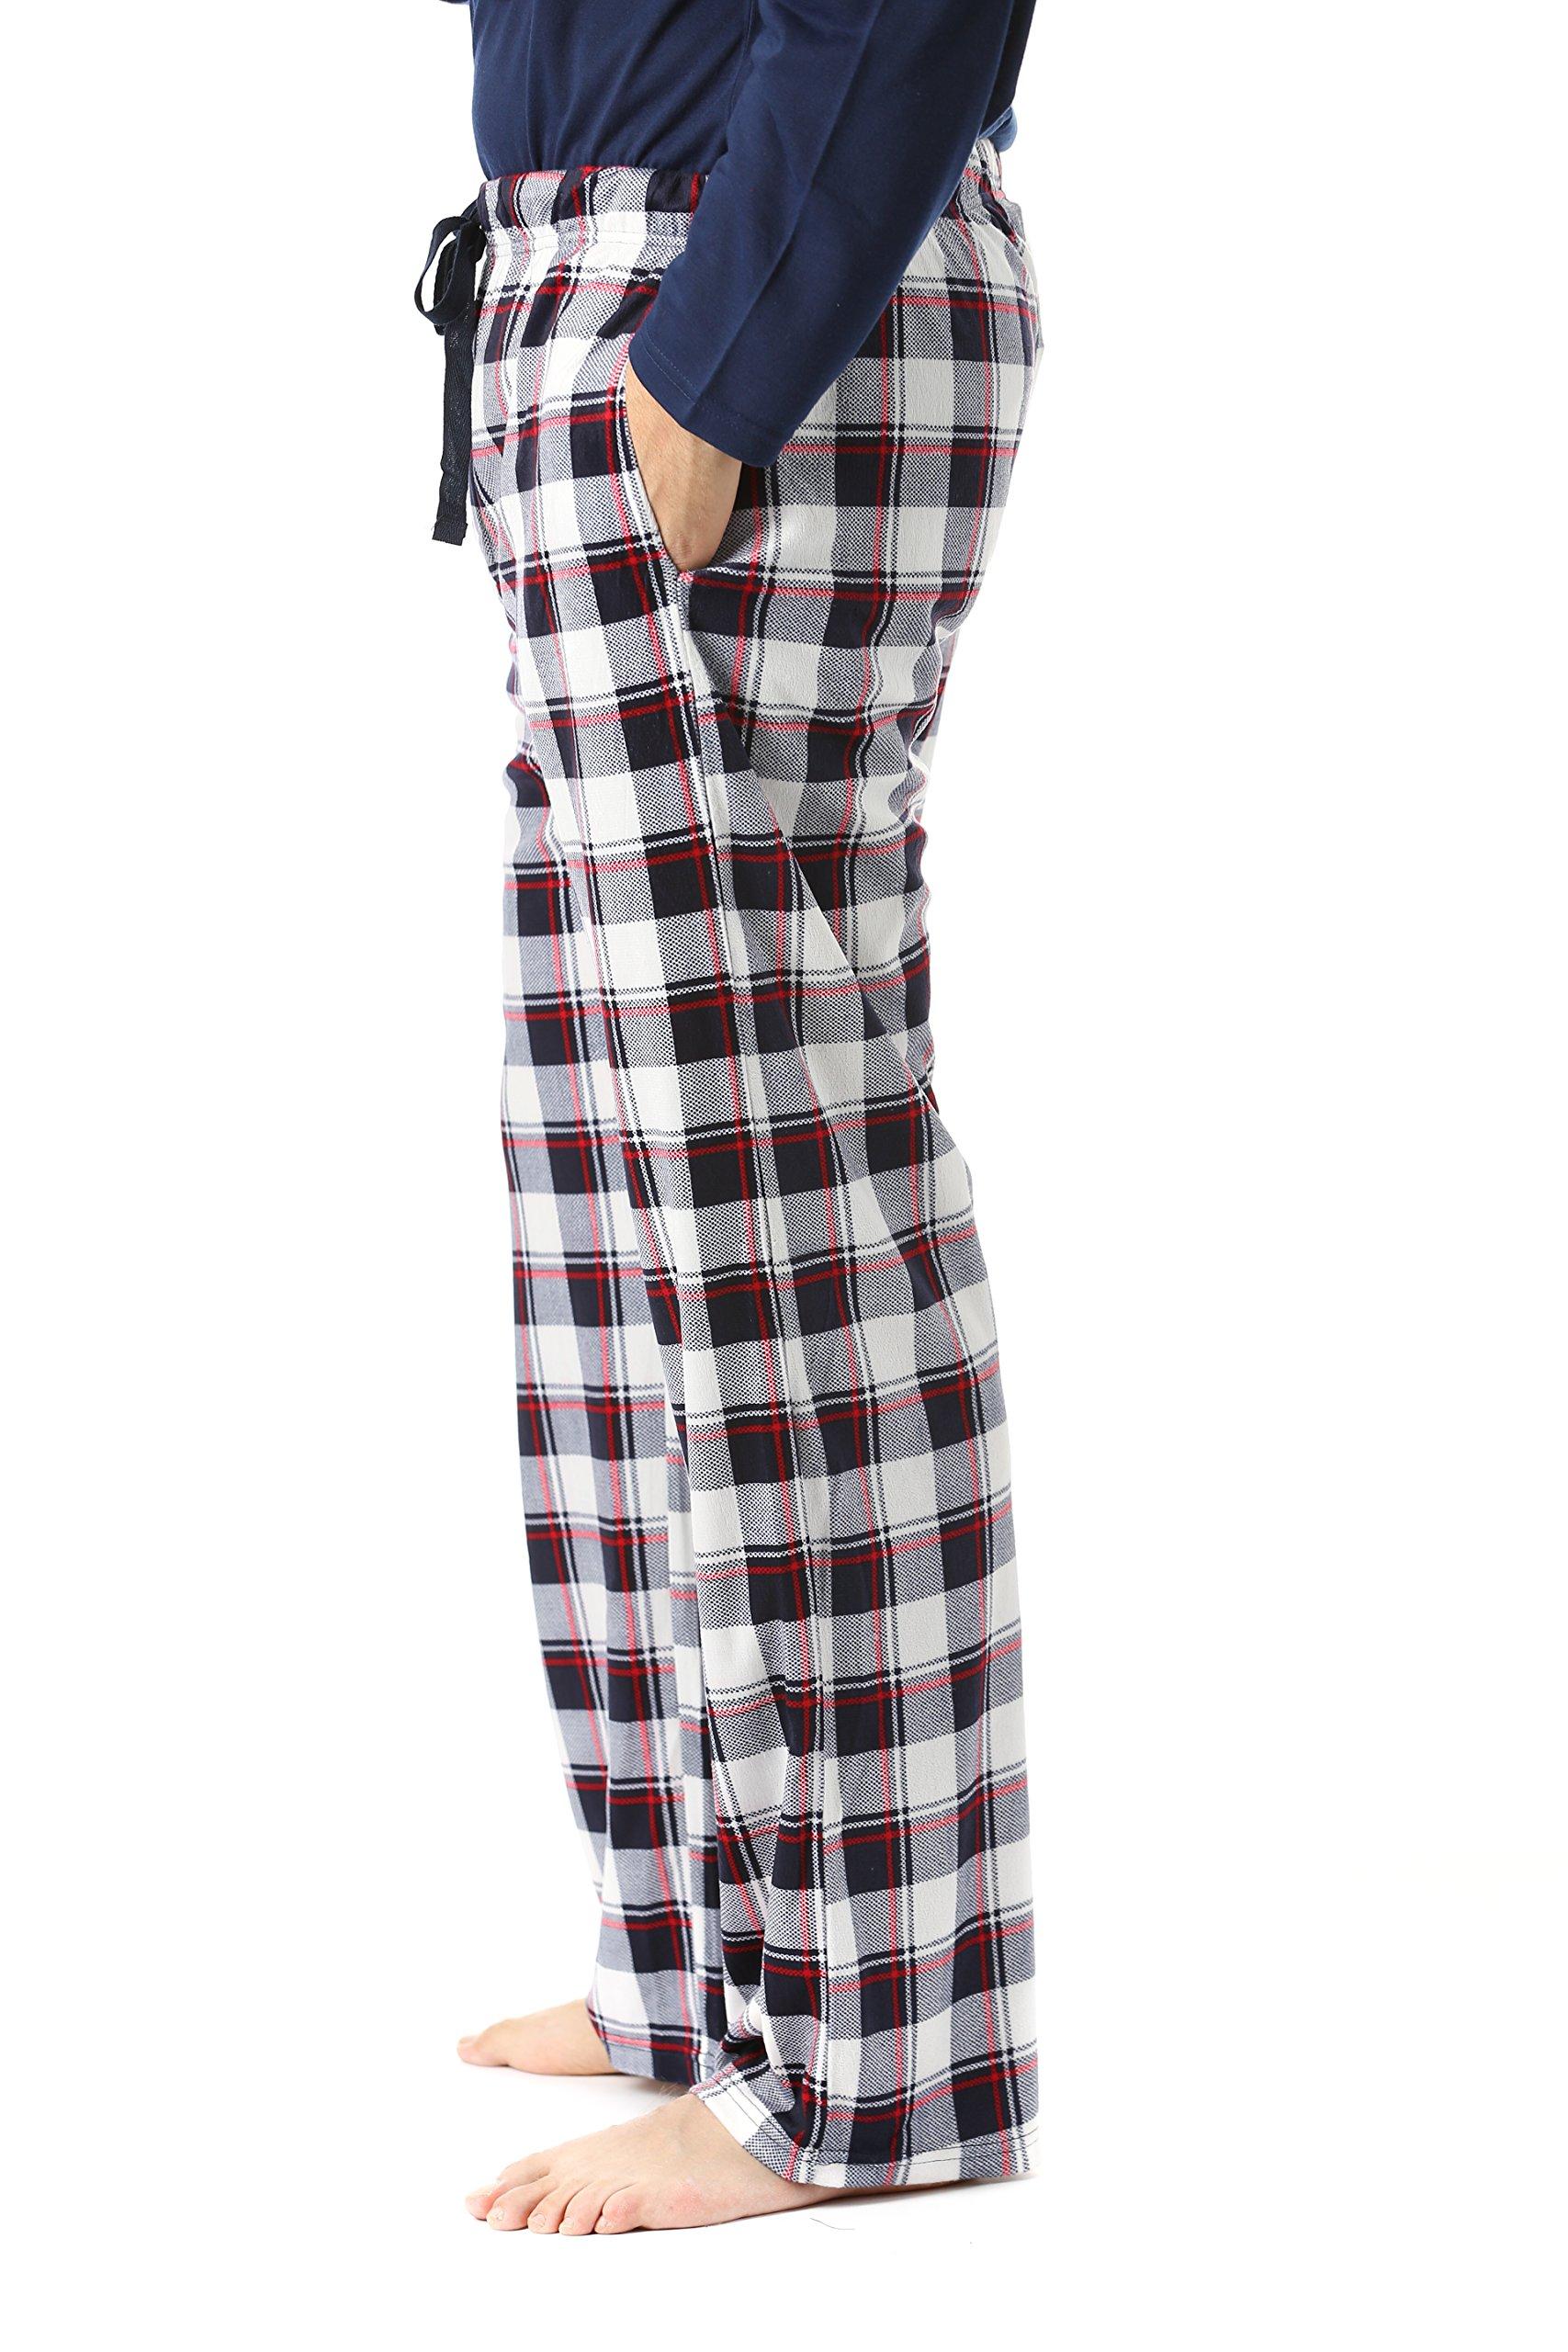 #FollowMe 45903-17-L Fleece Pajama Pants for Men/Sleepwear/PJs,Plaid 17,Large by #followme (Image #2)